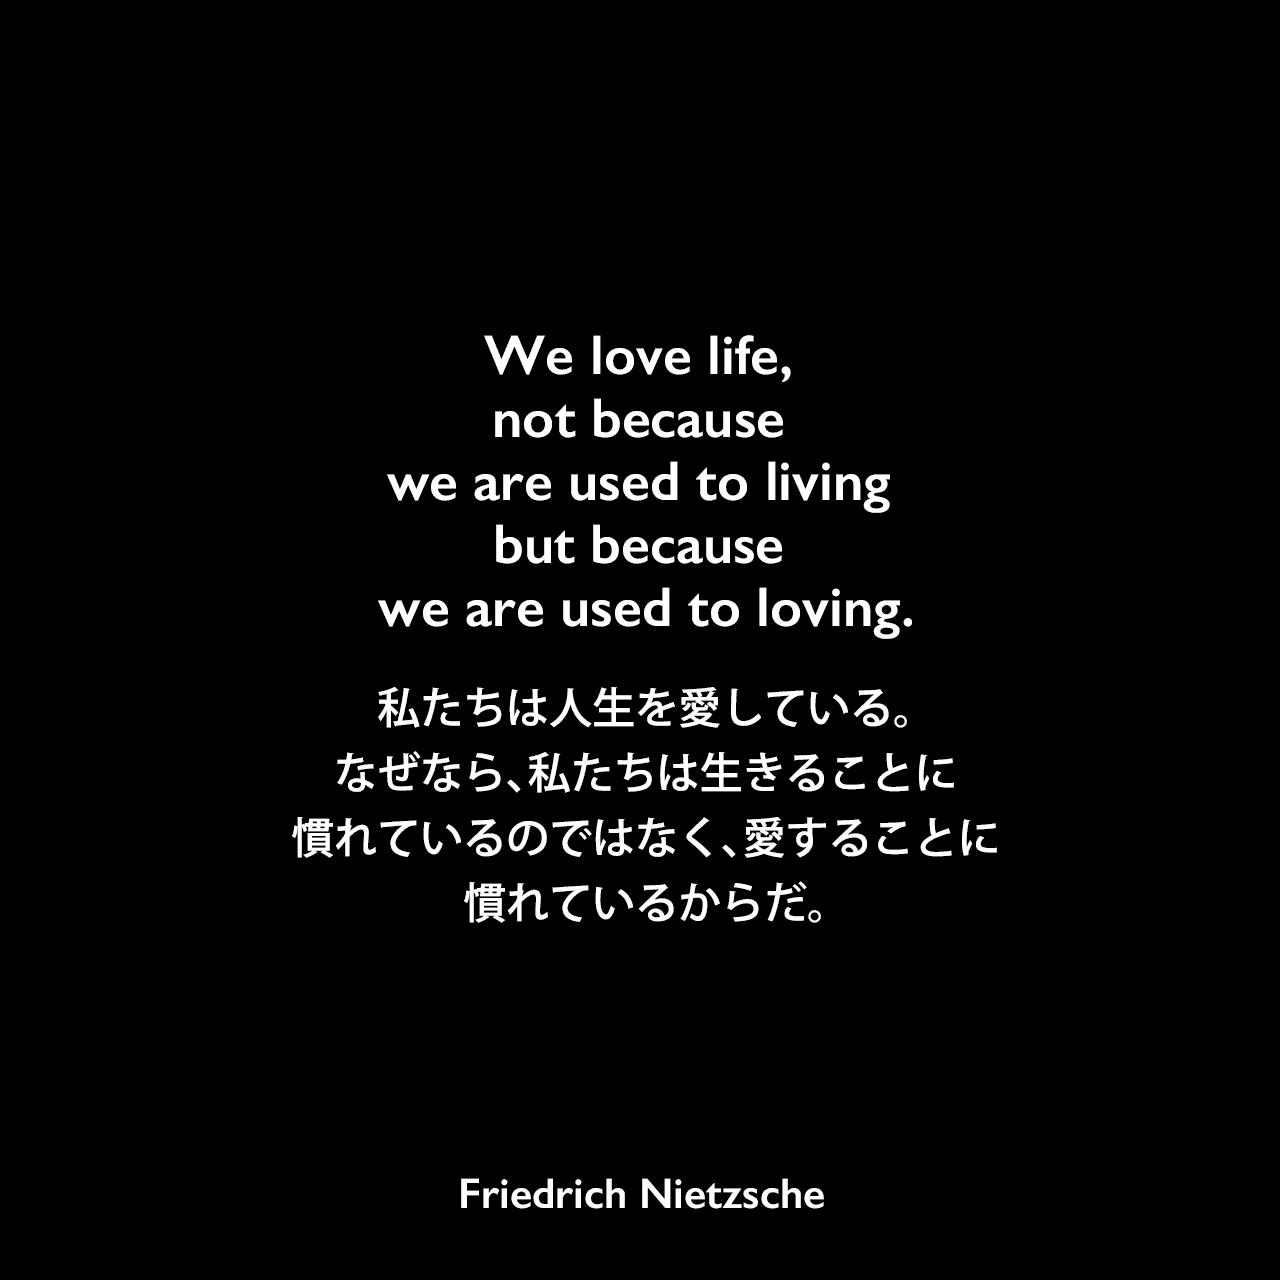 We love life, not because we are used to living but because we are used to loving.私たちは人生を愛している。なぜなら、私たちは生きることに慣れているのではなく、愛することに慣れているからだ。Friedrich Nietzsche